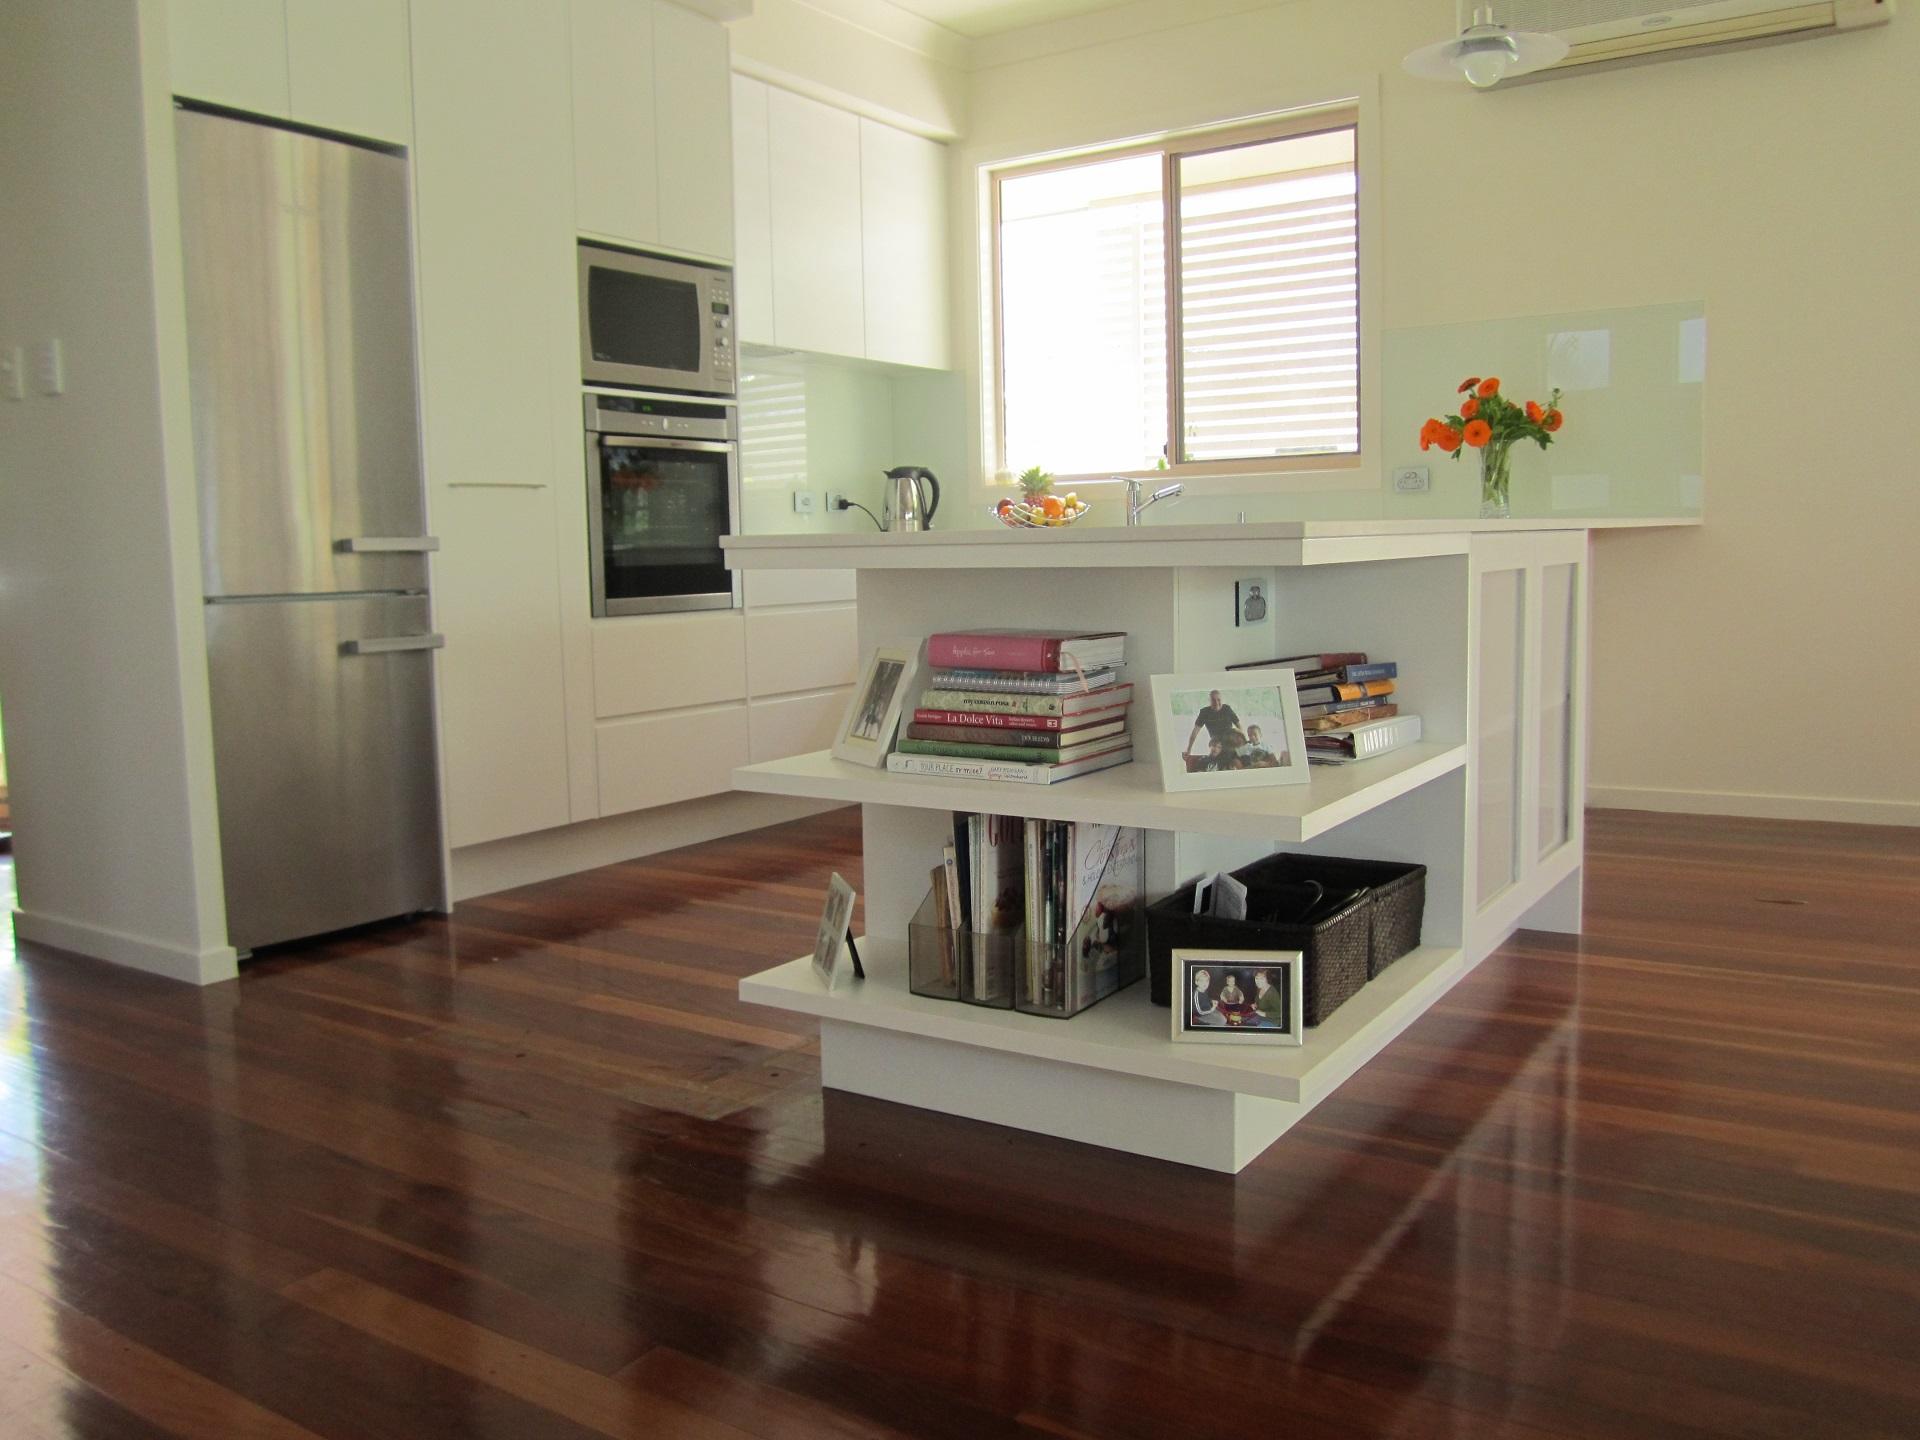 brisbane-kitchen-design-the-grange-contemporary-kitchen-renovation2